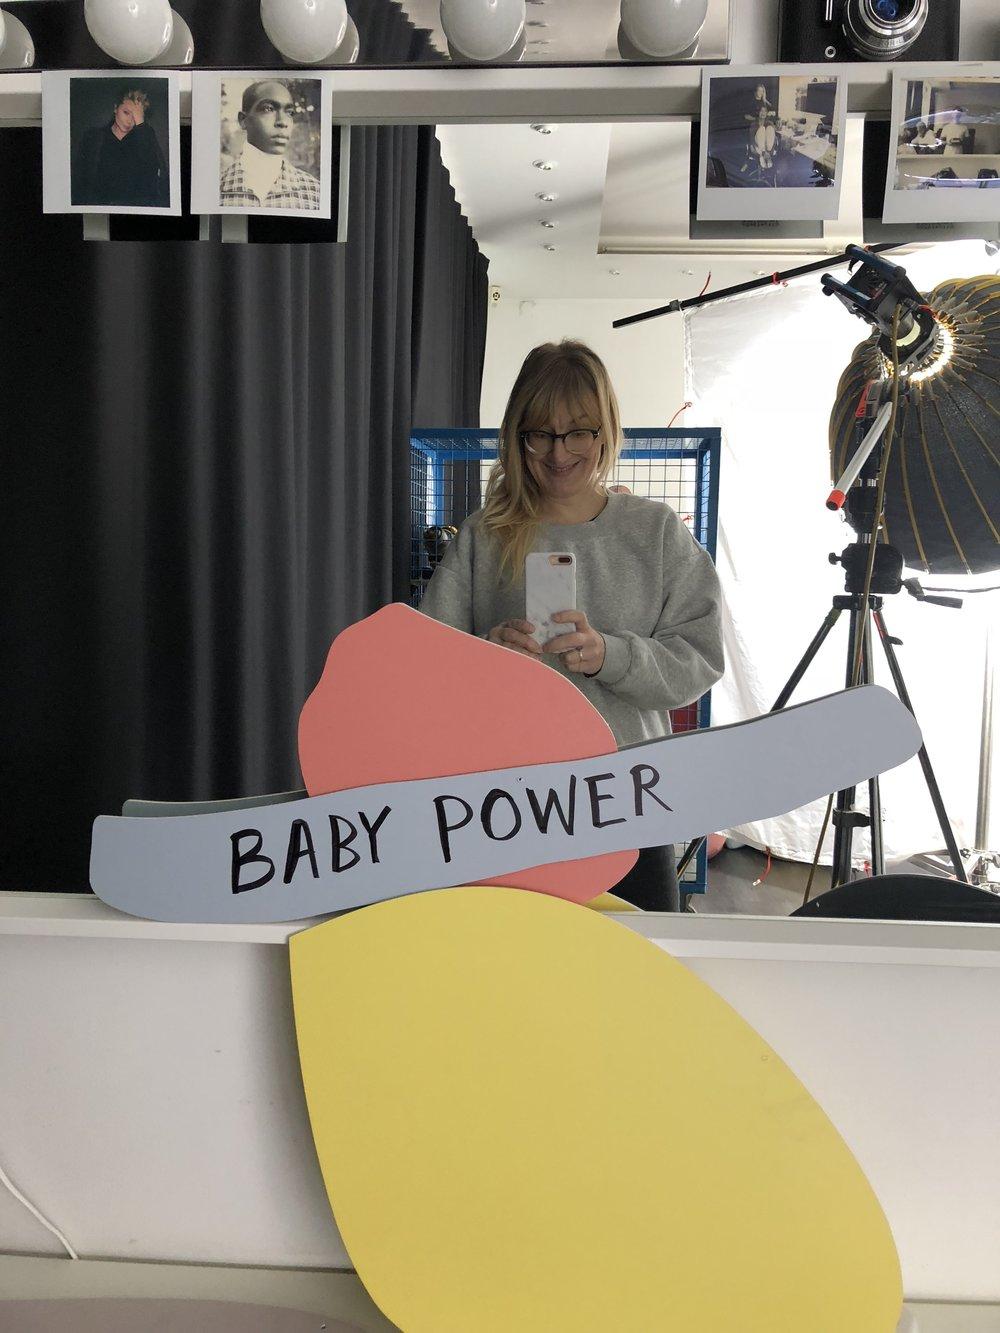 selfie at babypower photoshoot.jpg